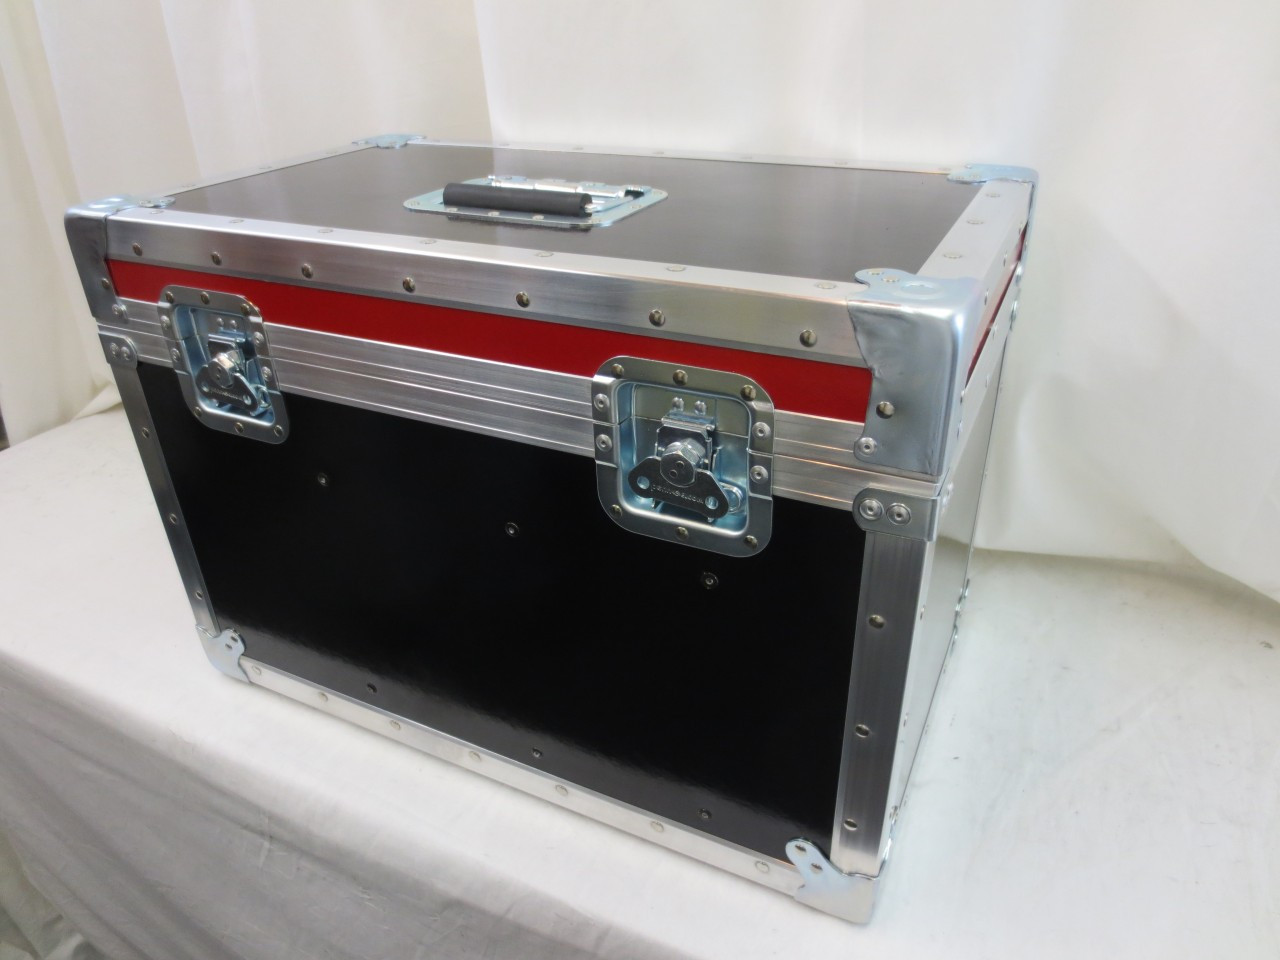 Sony PVM 1741 Monitor Shipping Case